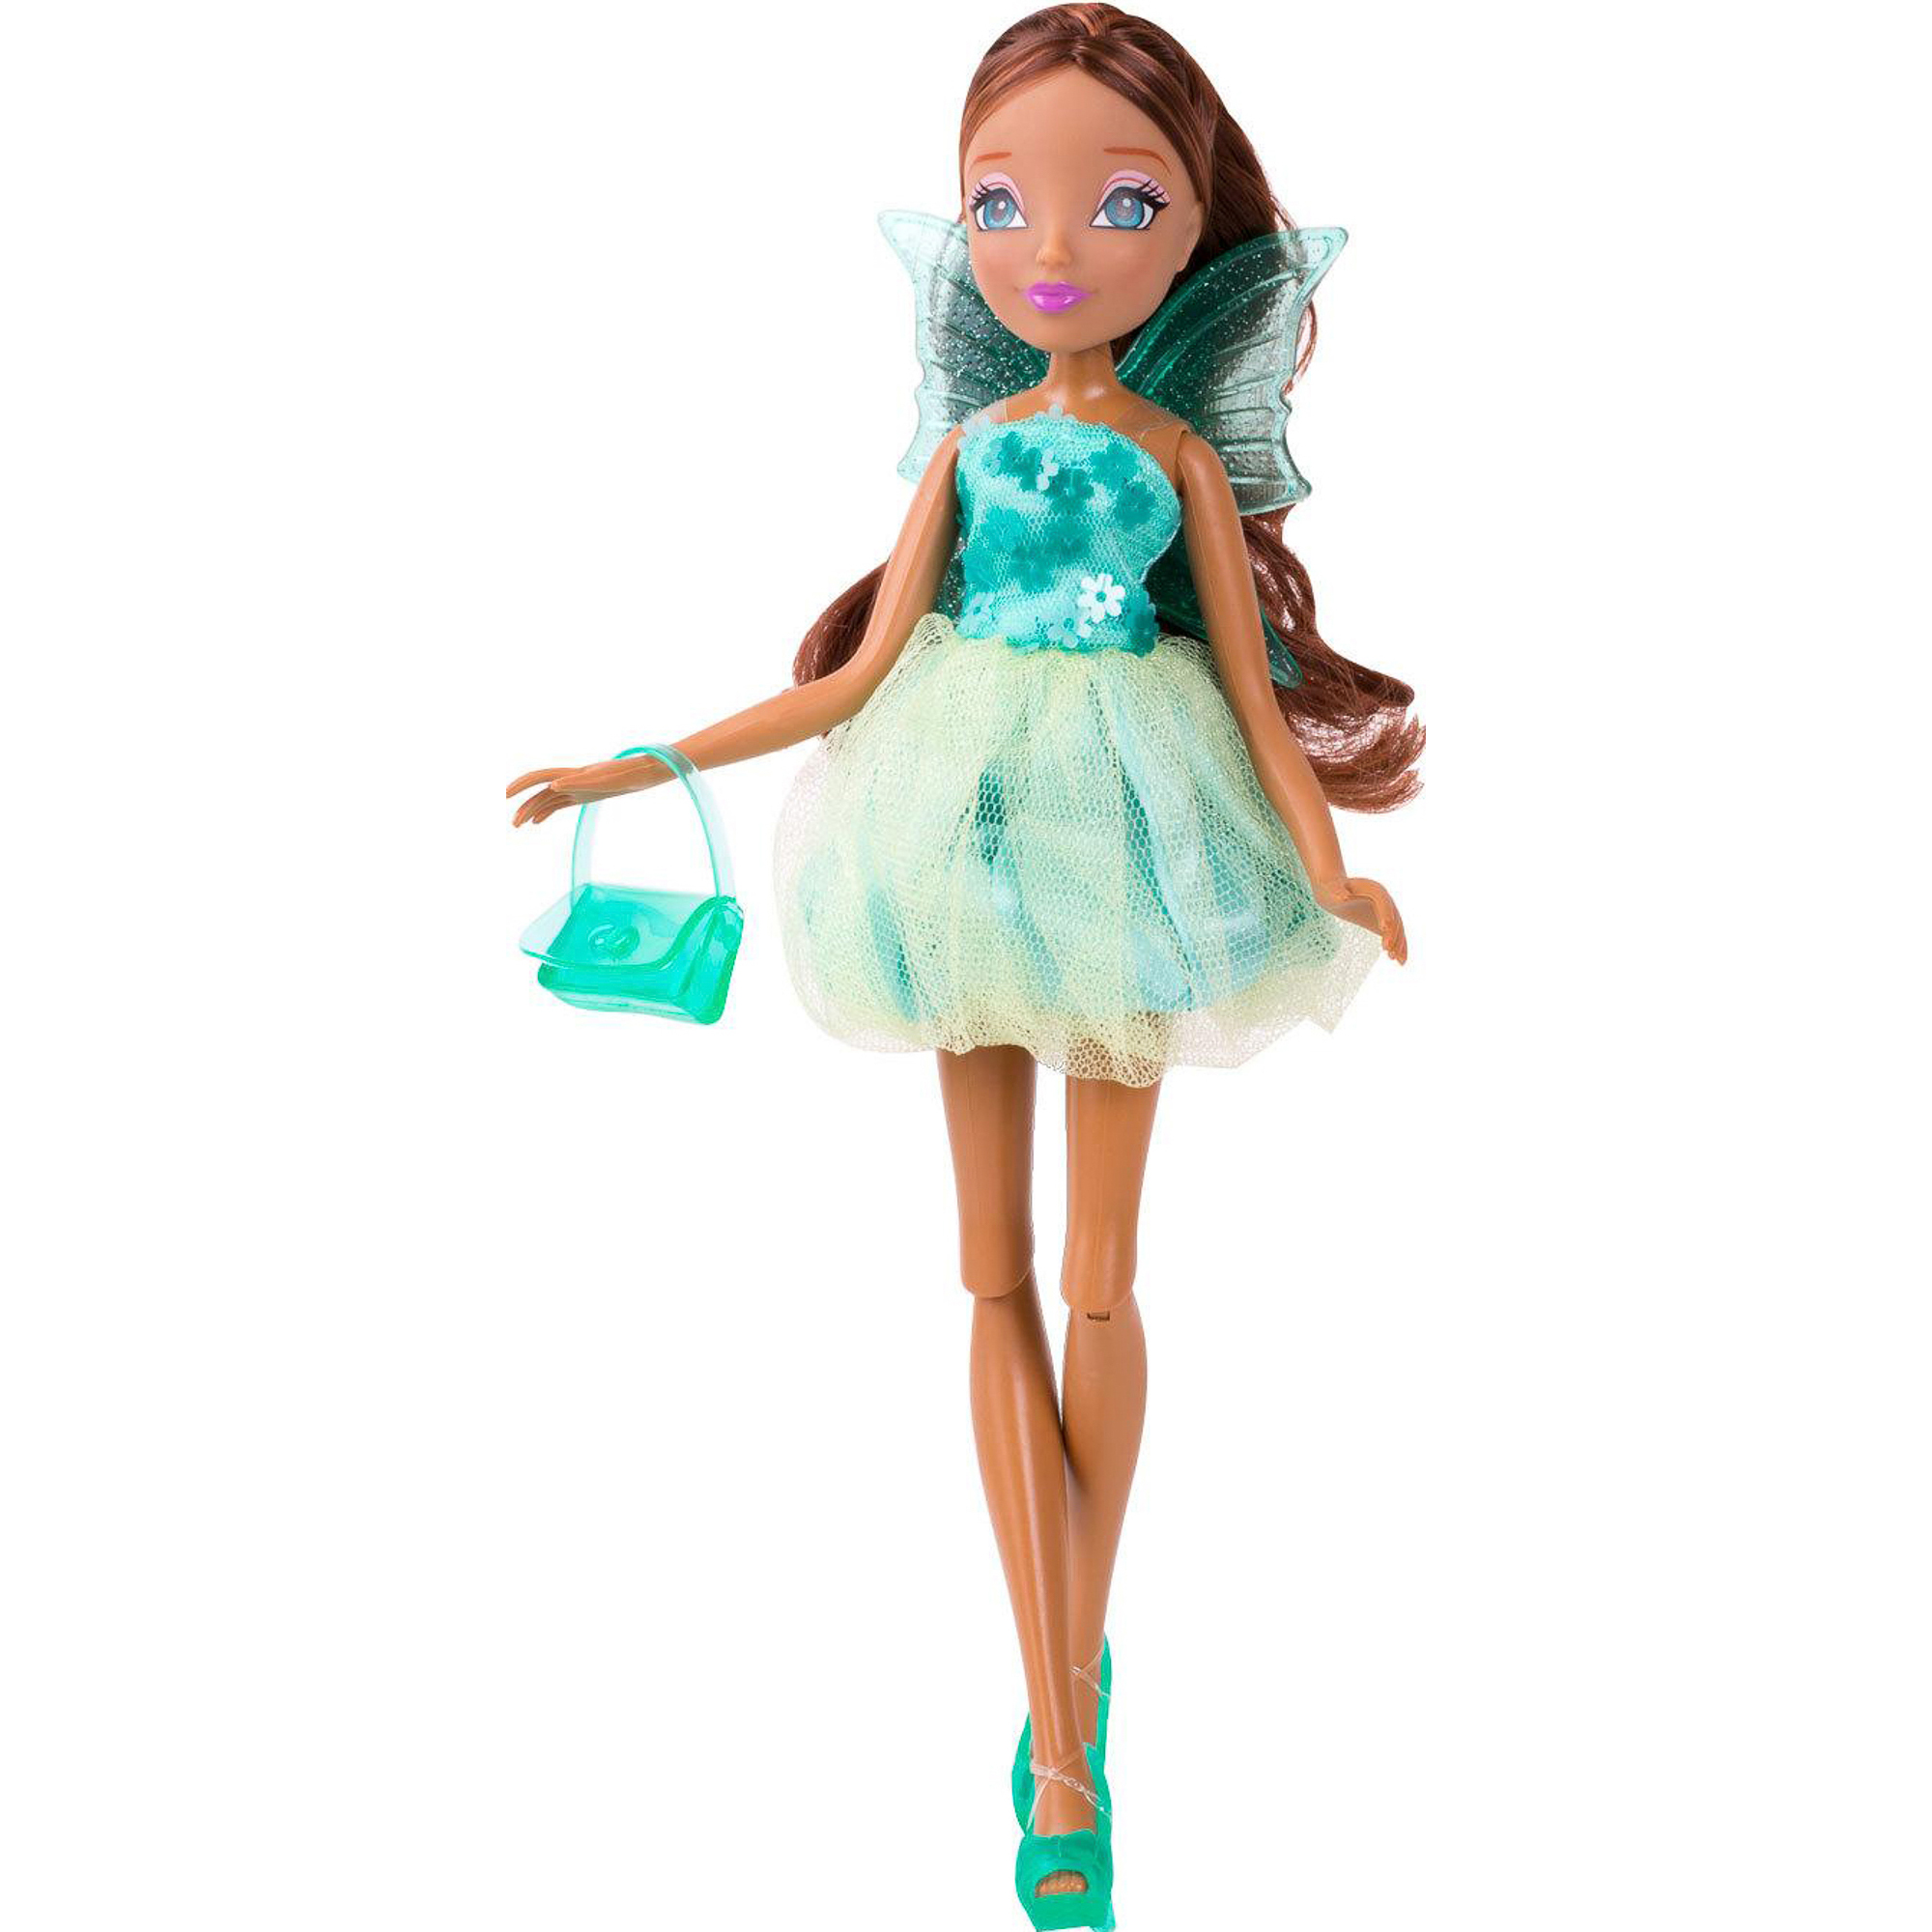 Кукла Winx Club Бон Бон Лейла 28 см кукла winx club онирикс лейла iw01611805